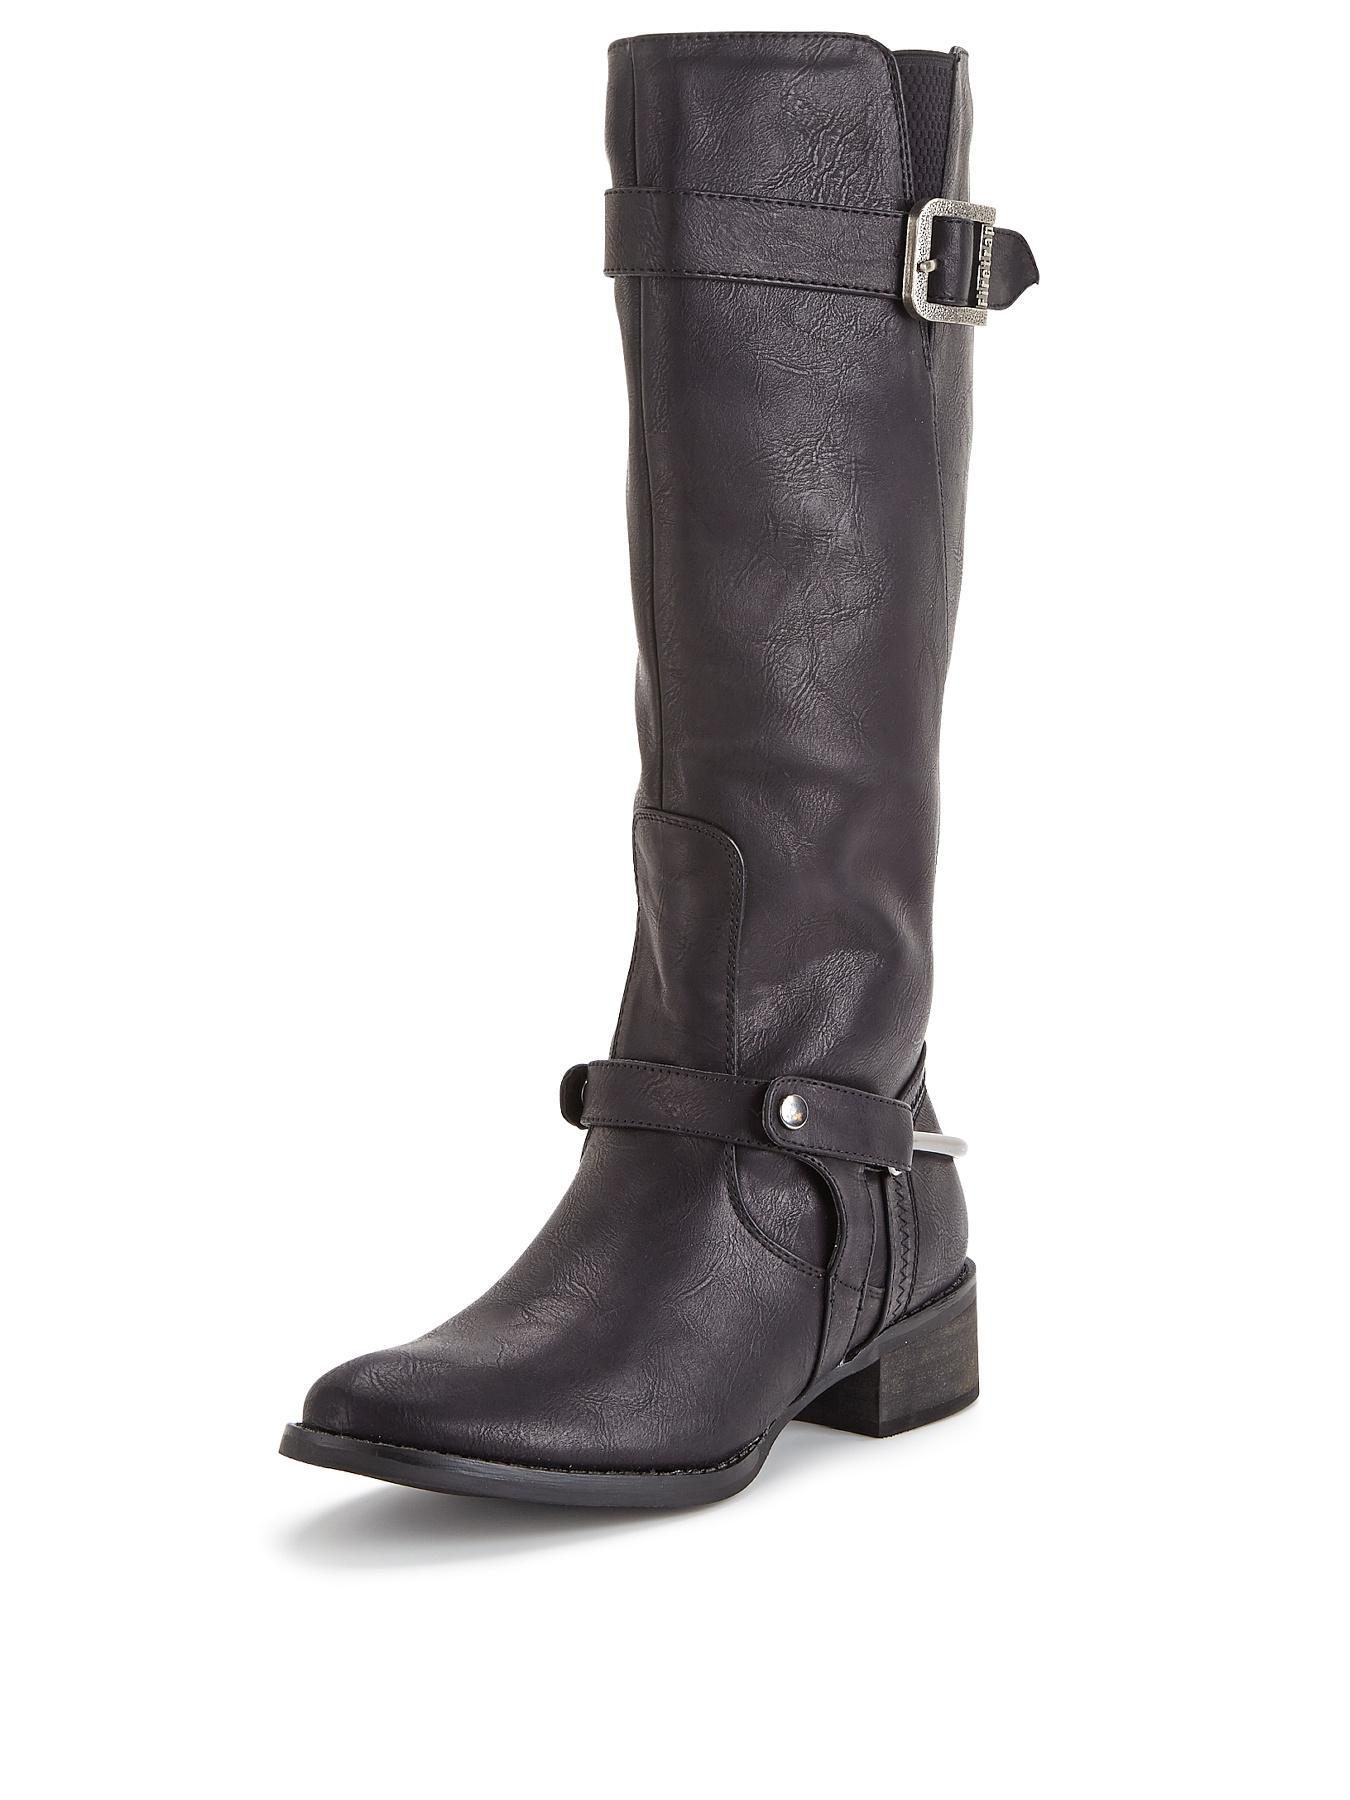 Firetrap Rainy Knee High Boot